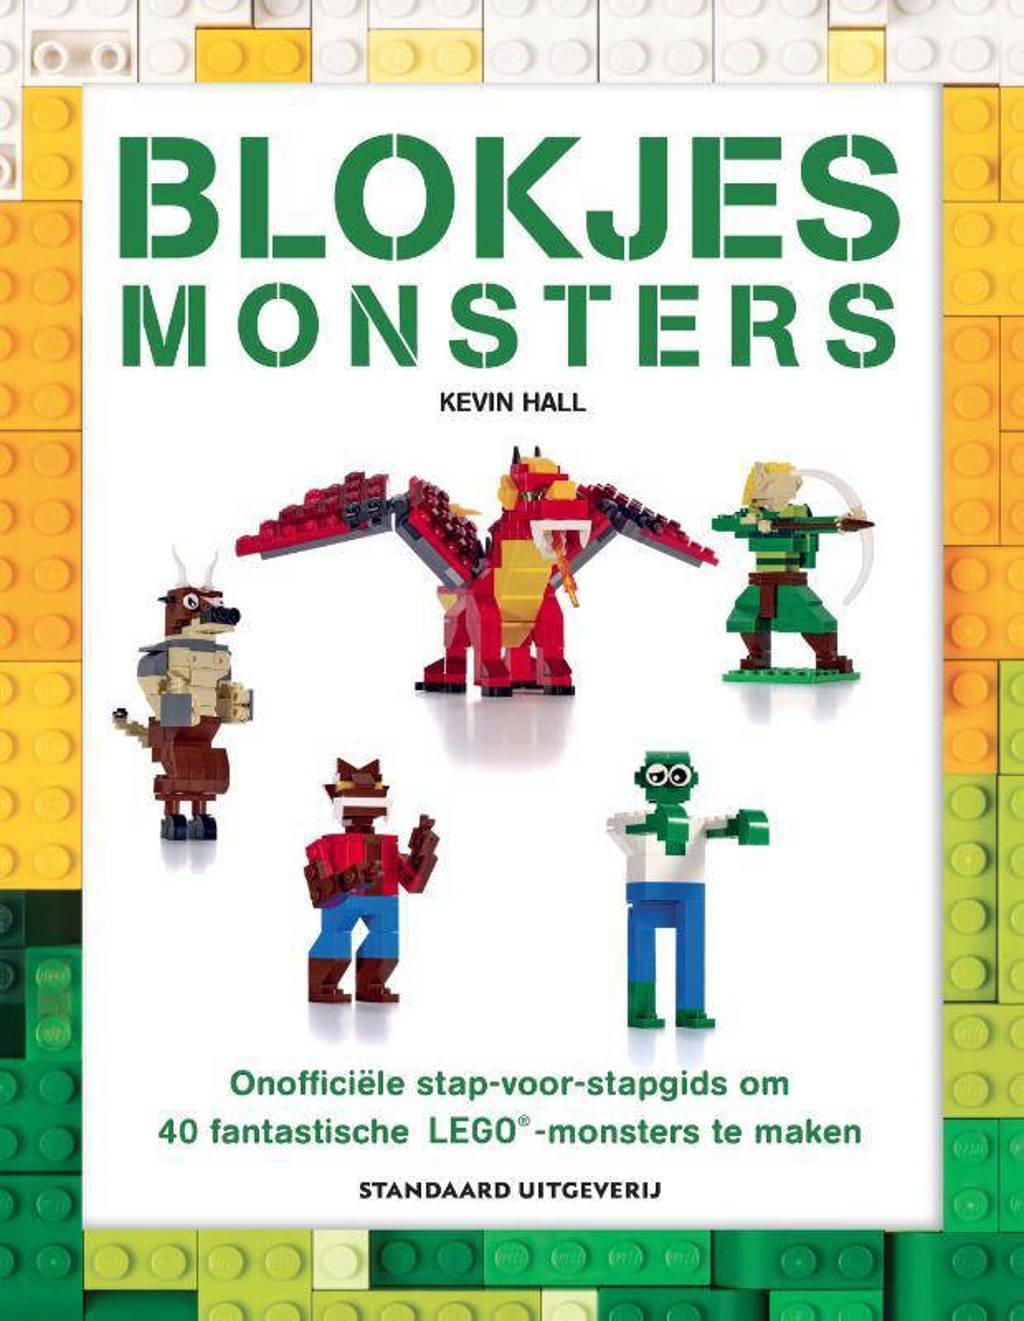 Blokjes monsters - Kevin Hall